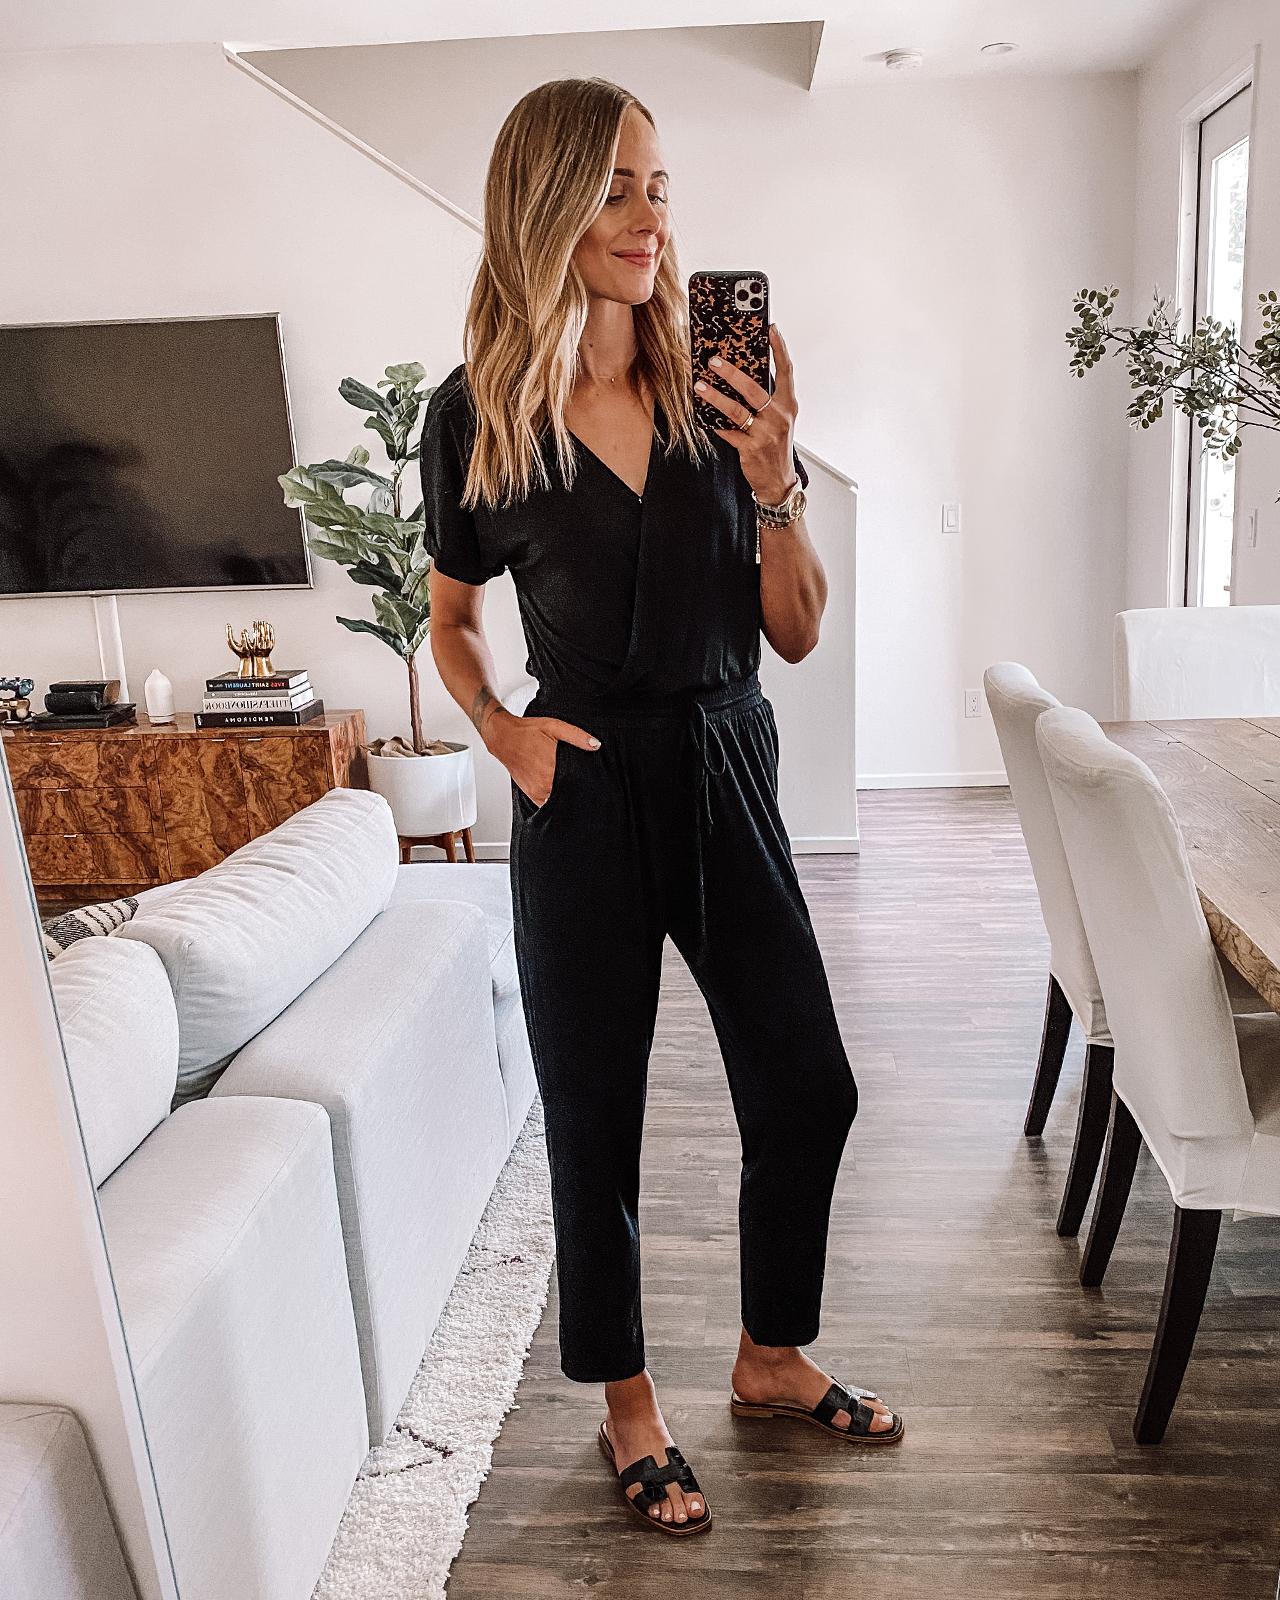 Fashion Jackson Wearing Nordstrom Black Jumpsuit Black Sandals